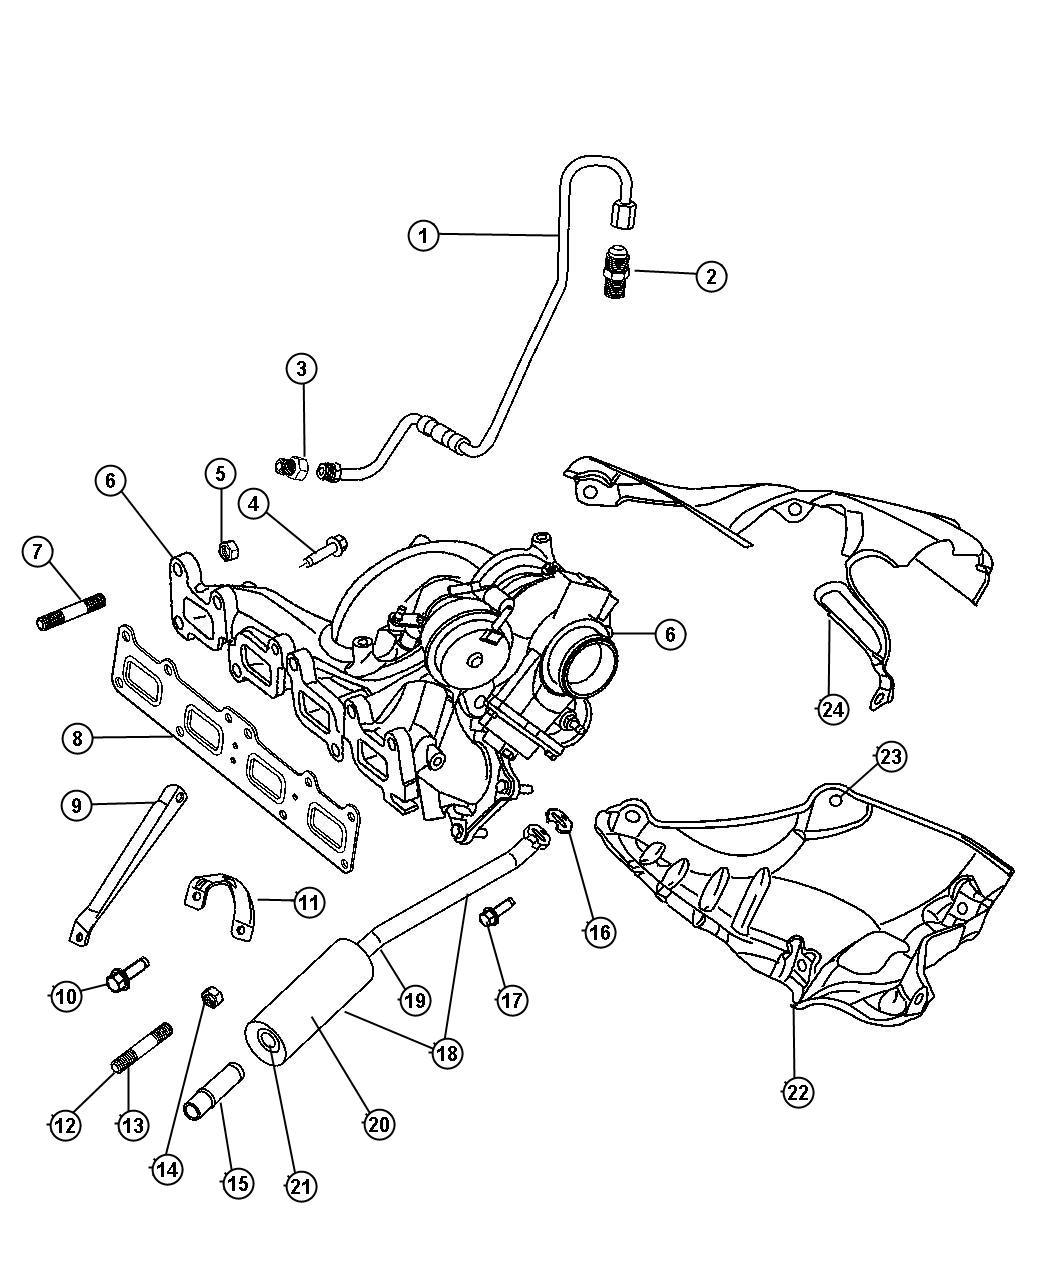 Dodge Charger R T 392 6 4l Hemi Srt V8 Bolt Hex